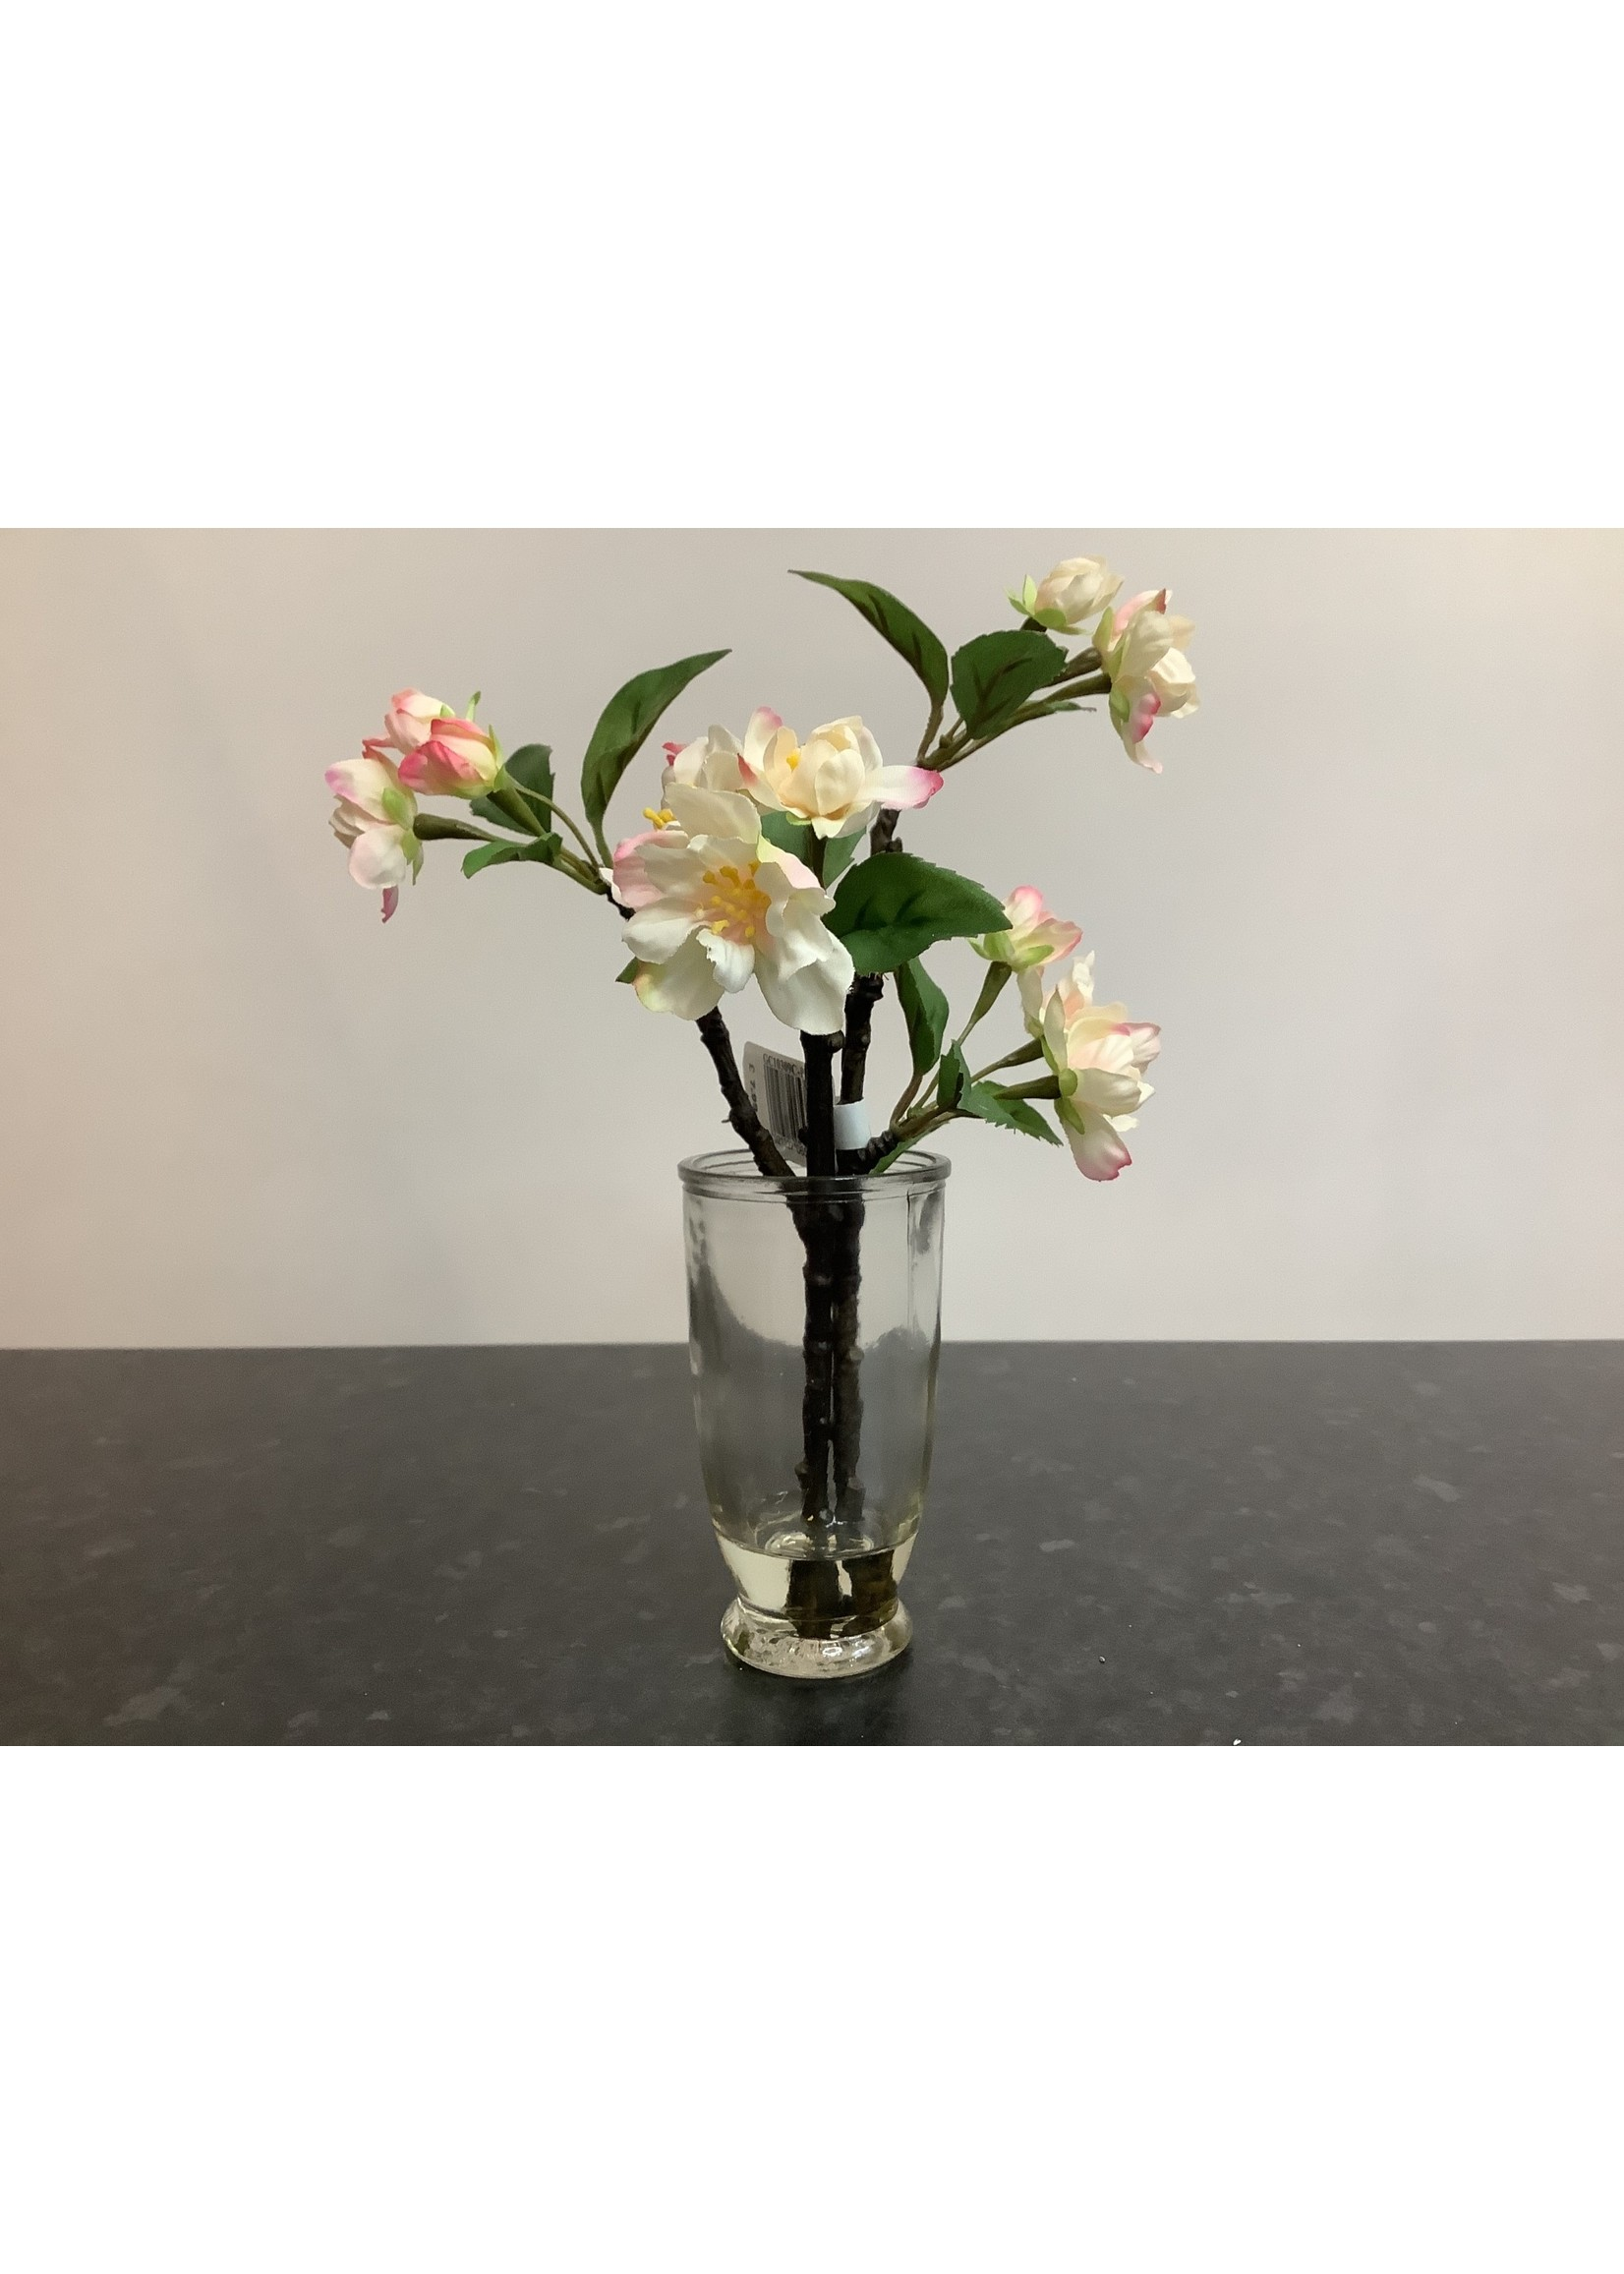 Small cherry blossom arrangement 25cm tall